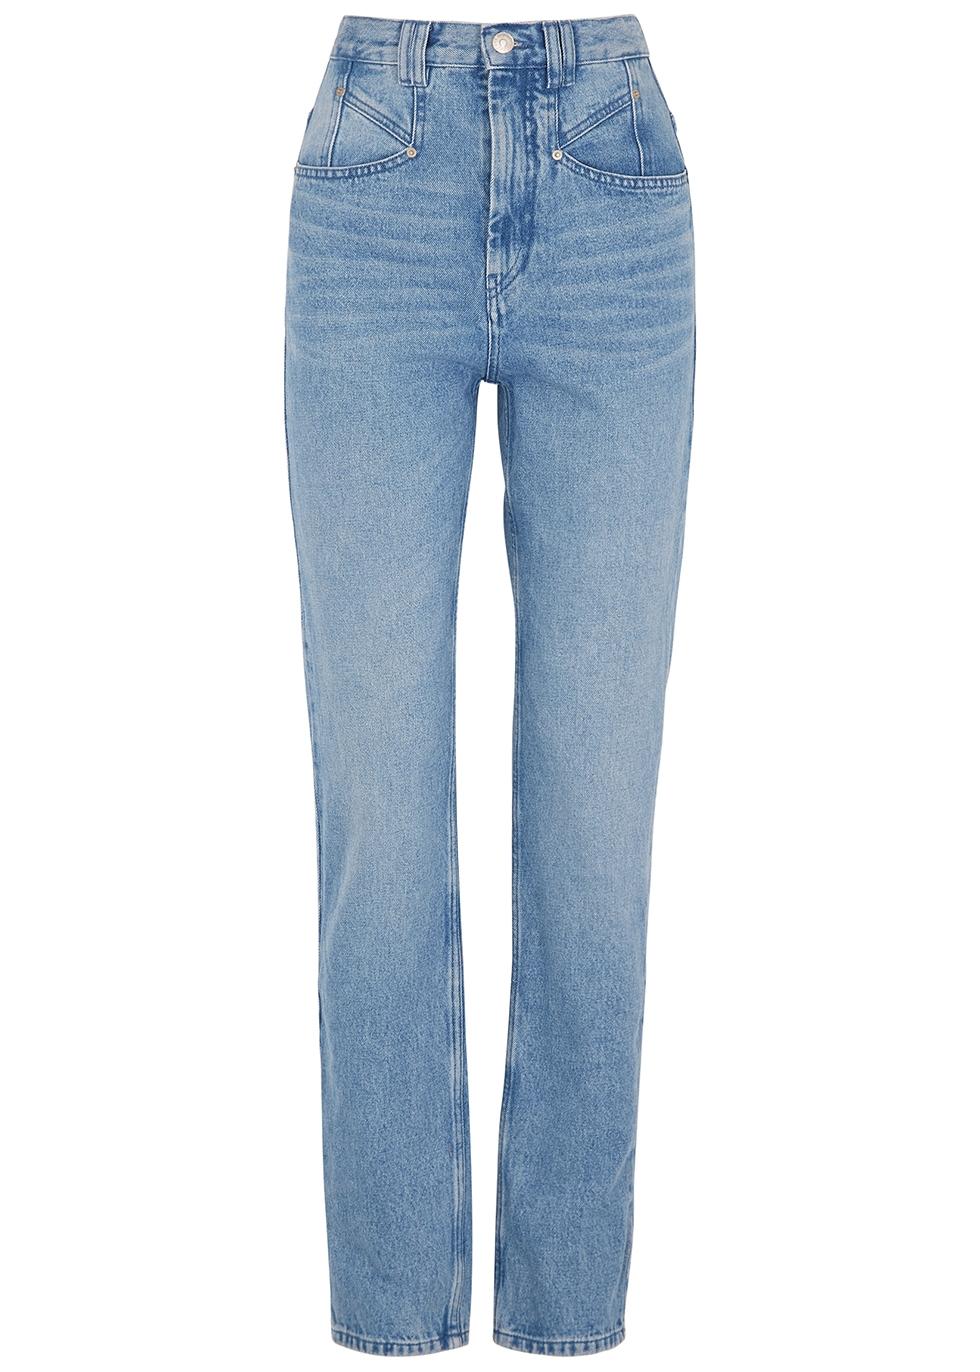 Dominic blue straight-leg jeans